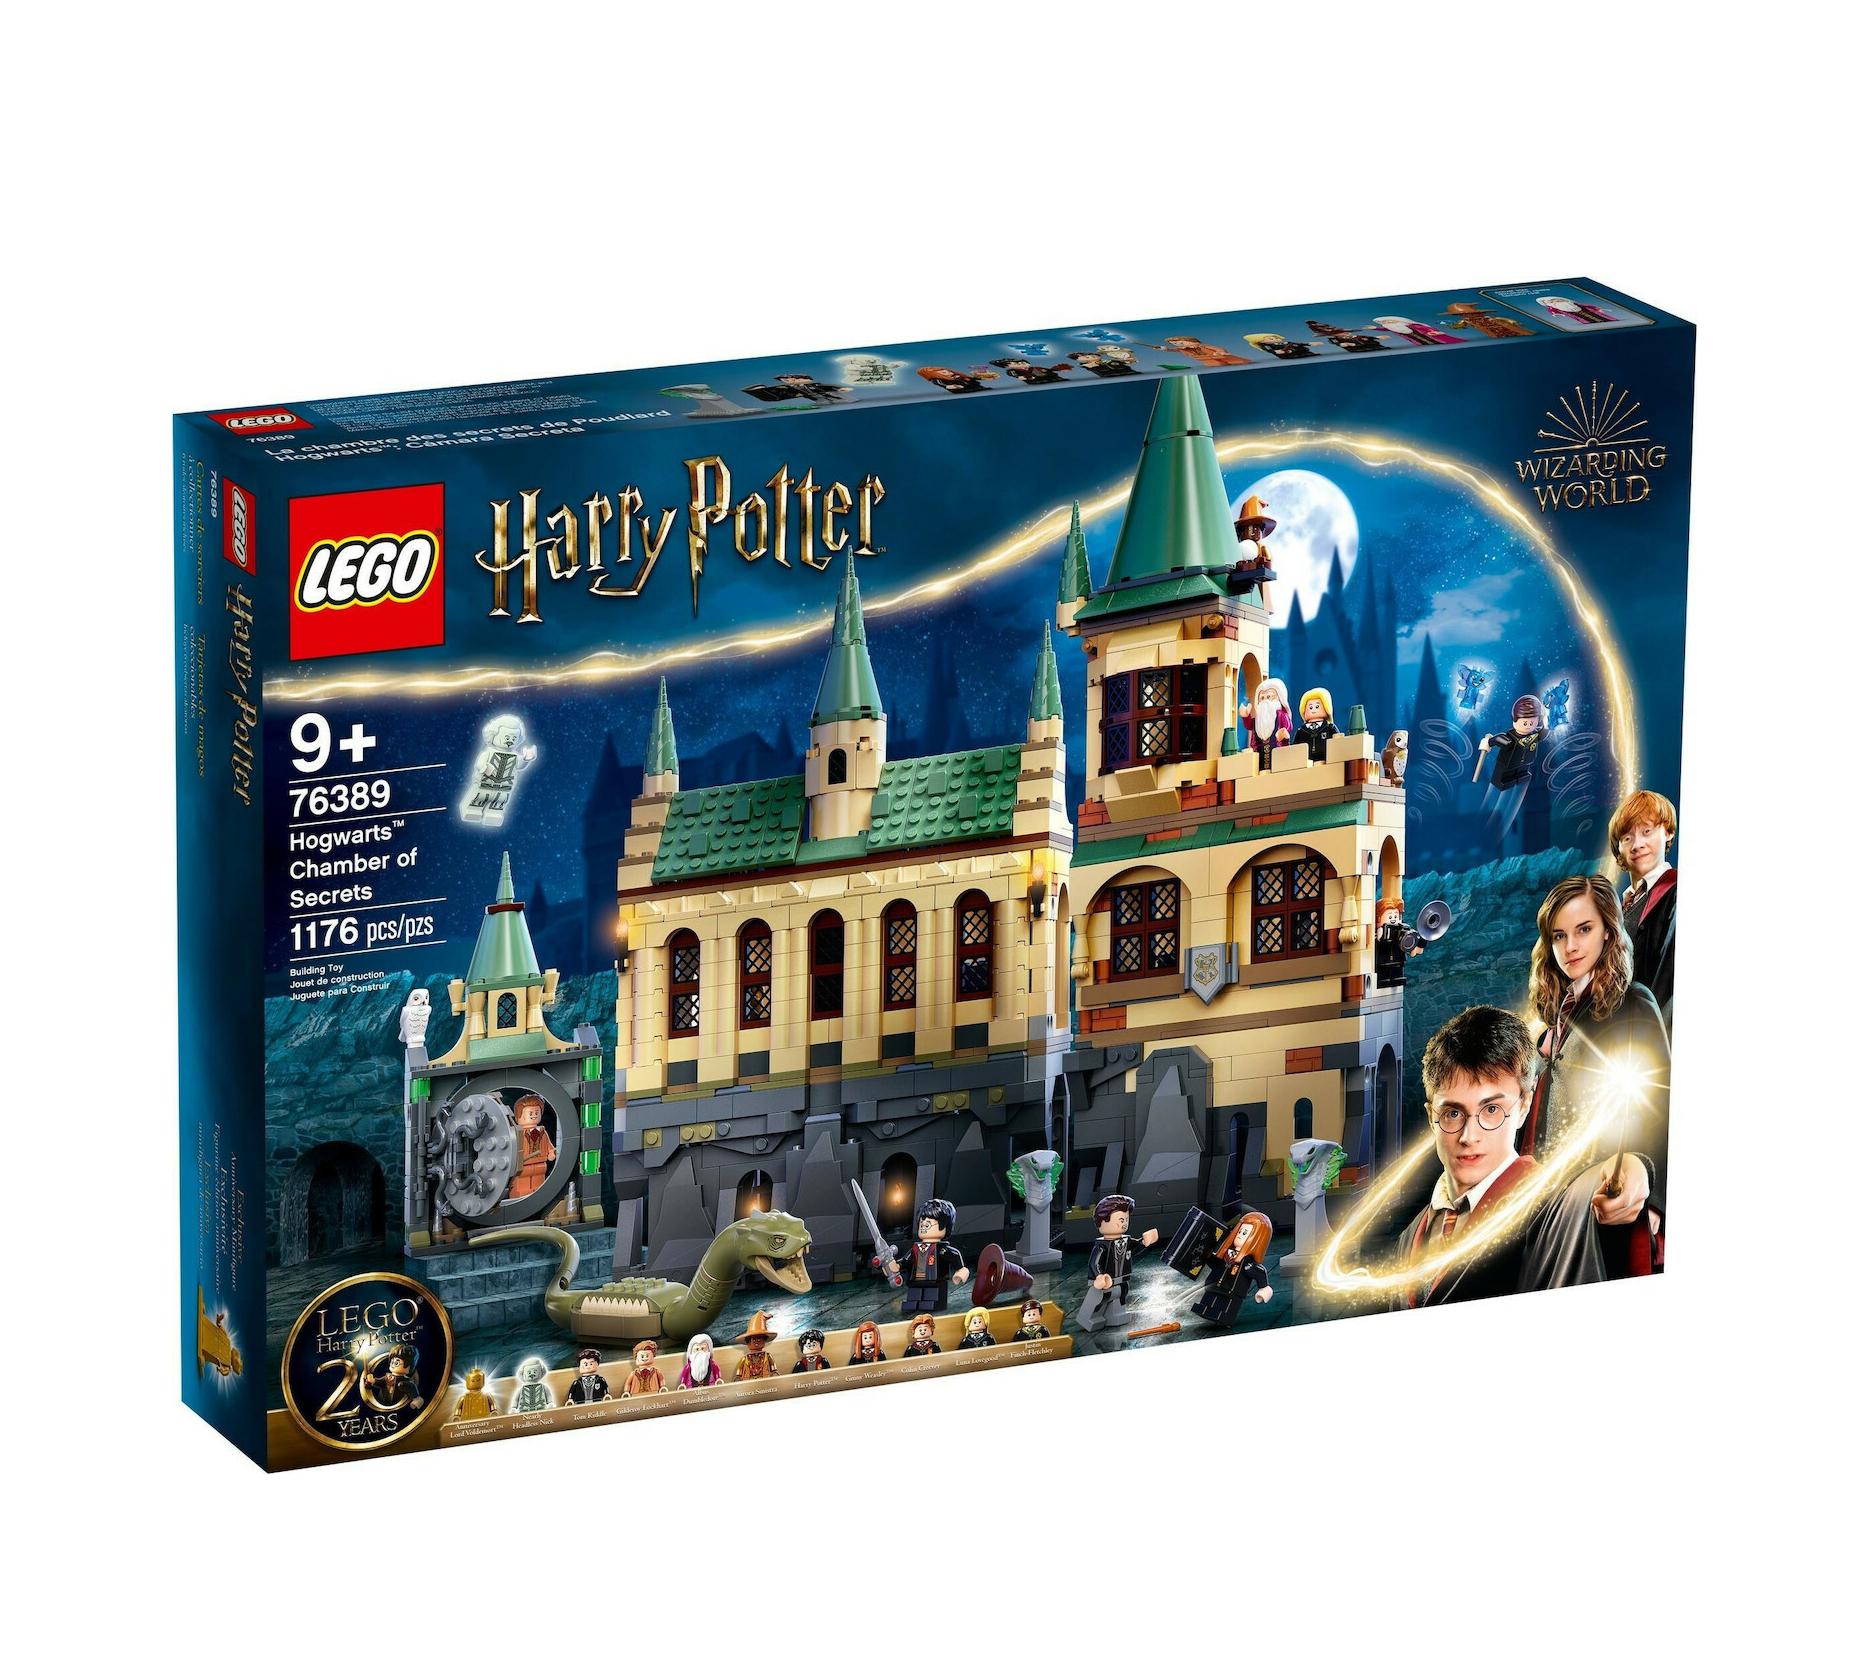 Lego Harry Potter: Hogwarts Chamber of Secrets 76389